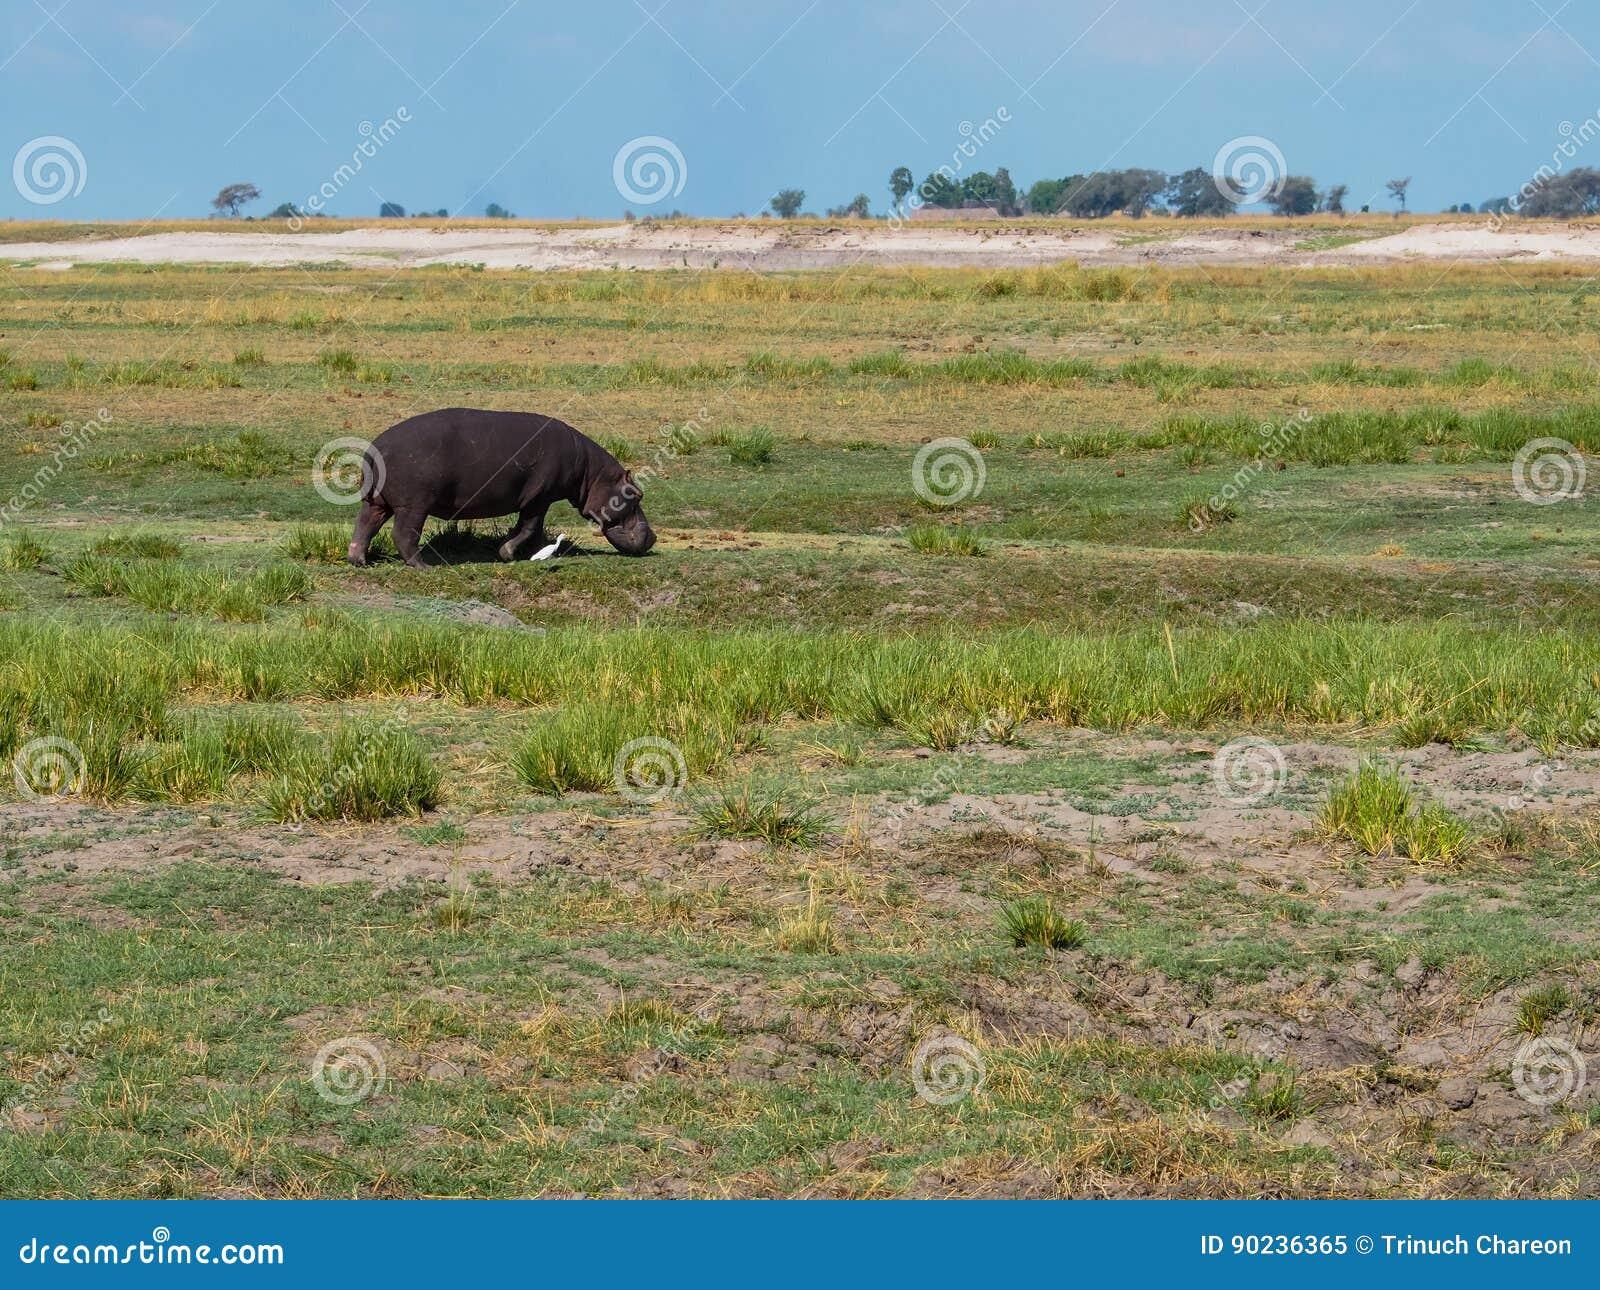 Hippopotamus walking with white egret bird in their habitat